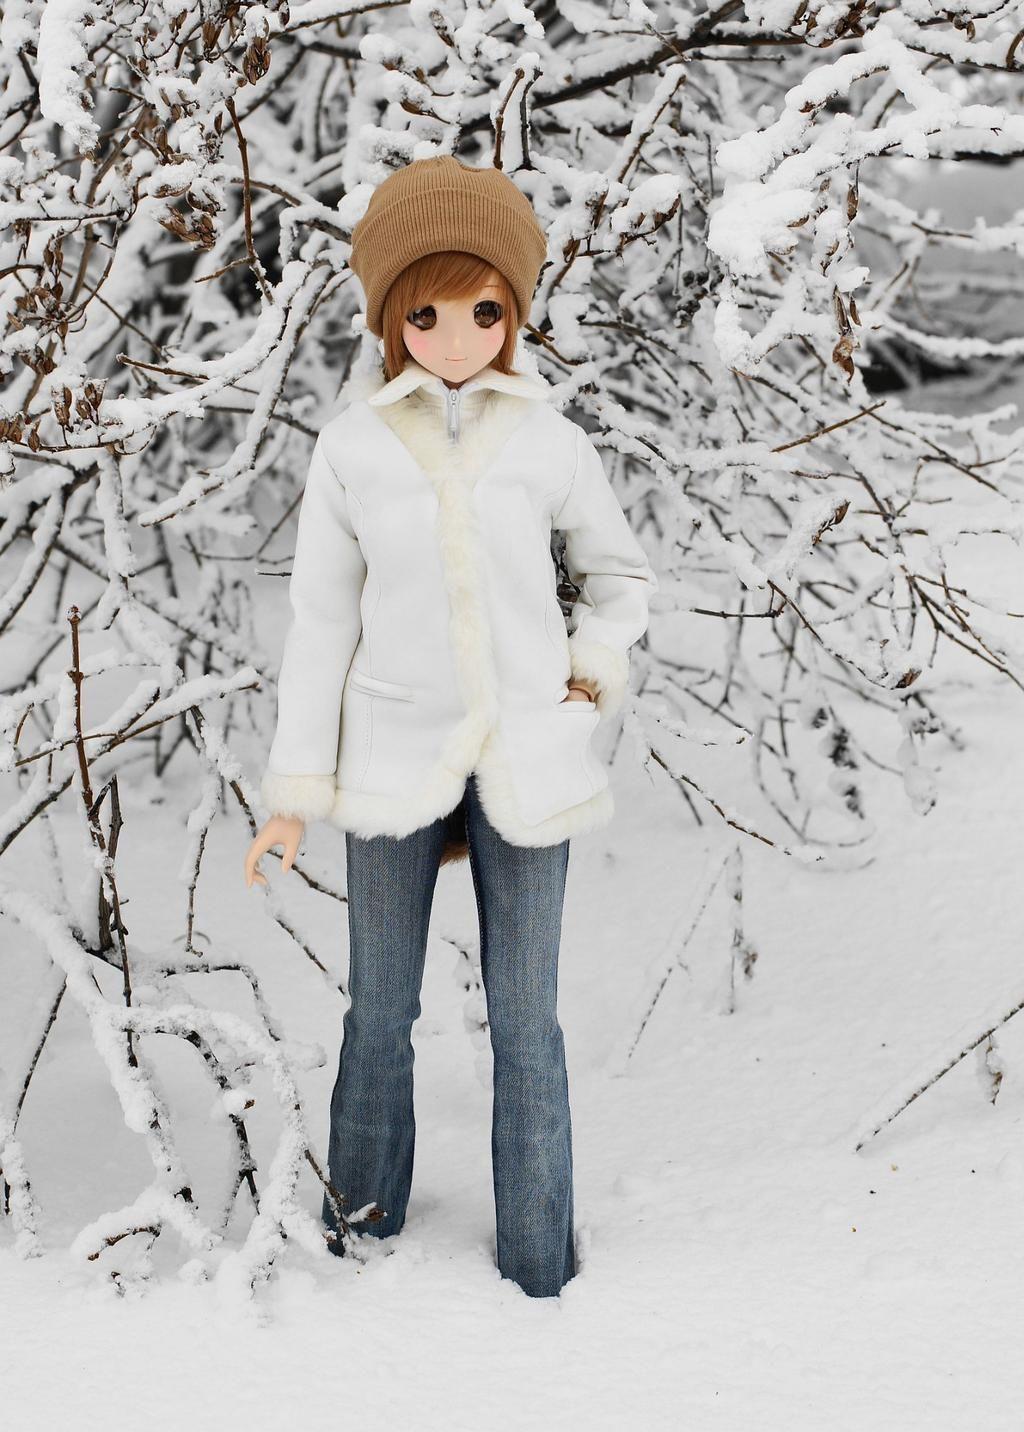 Mirai Suenaga Smart Doll by blackmercury_v